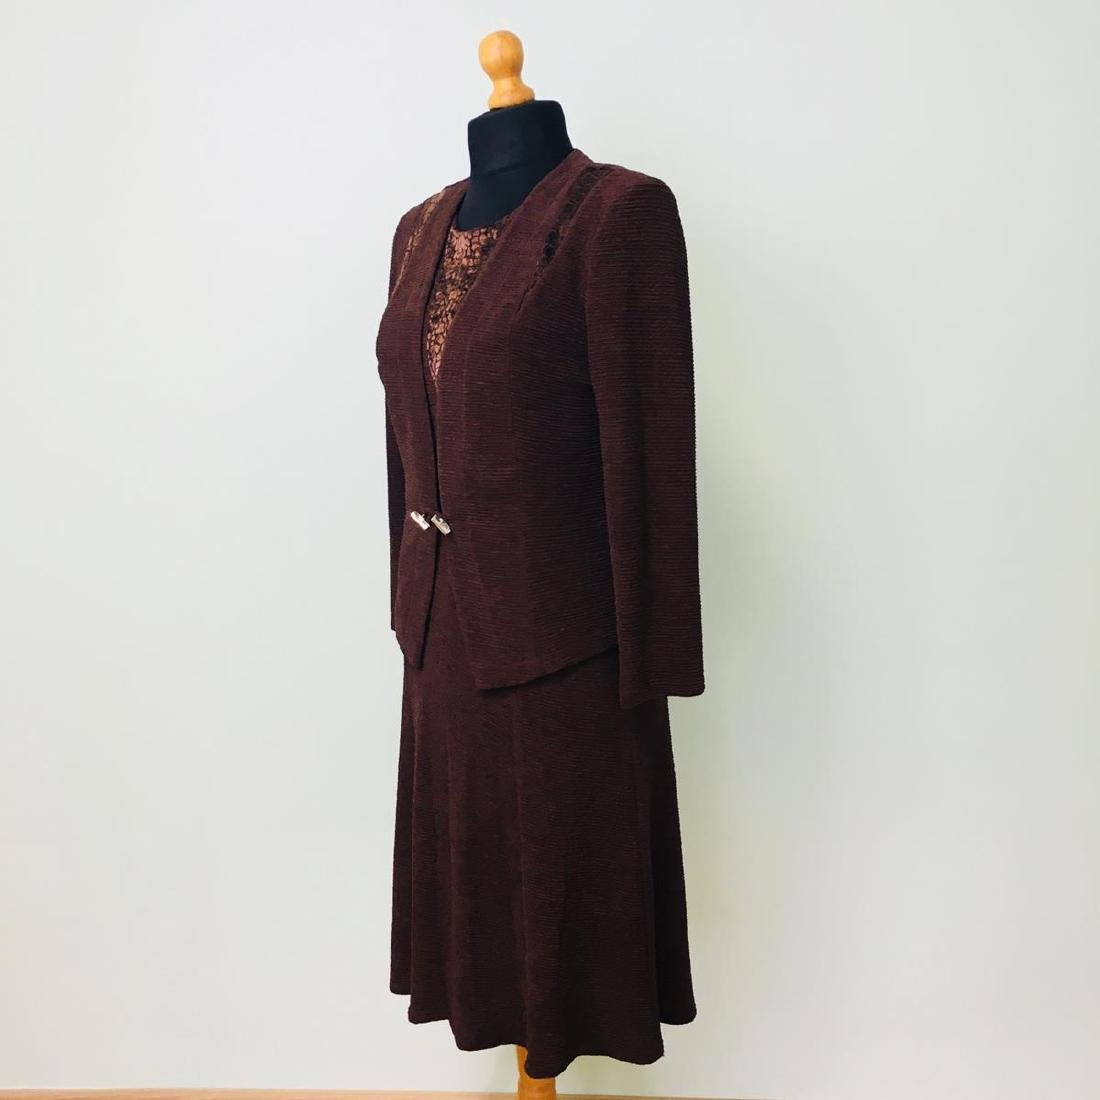 Vintage Women's 2 Piece Evening Jacket Dress Size M - 3